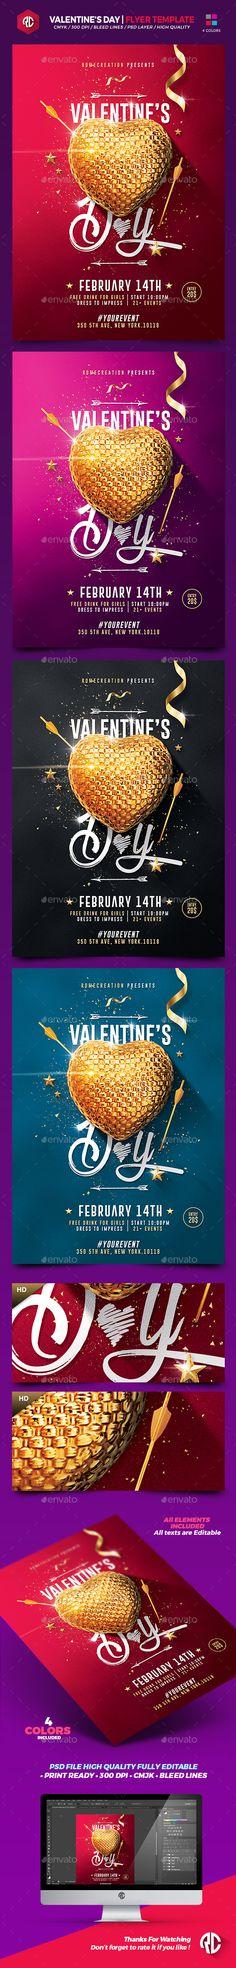 Valentine's Day Flyer Template PSD #design Download: http://graphicriver.net/item/valentines-day-flyer-template/14366135?ref=ksioks